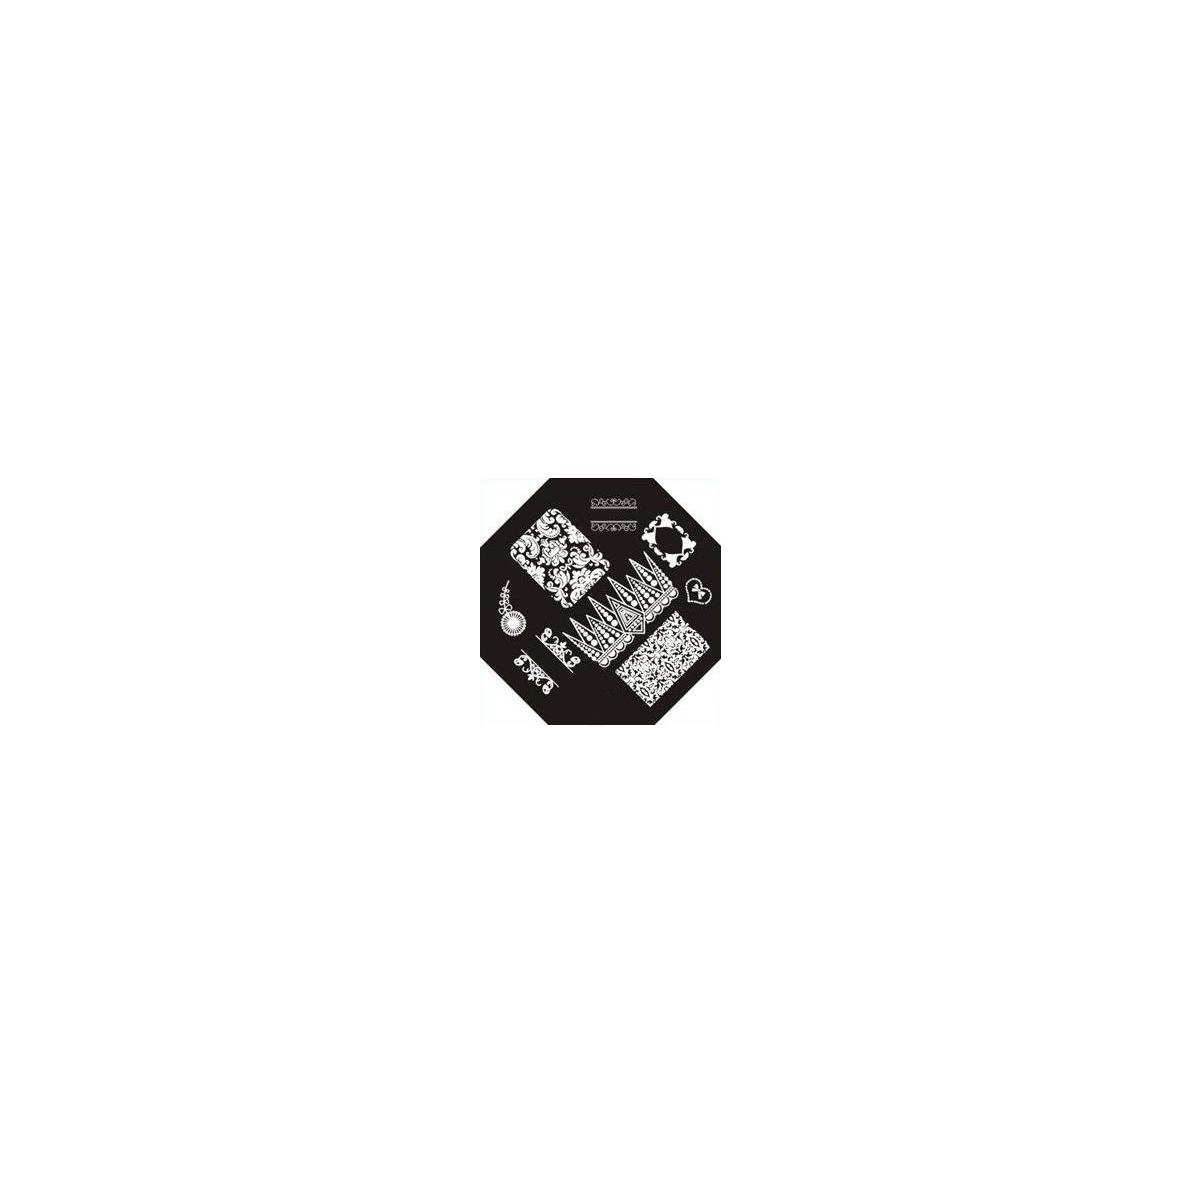 https://www.kit-manucure.com/1377-thickbox_default/plaque-de-stamping-baroque-arabesque-et-dentelle.jpg